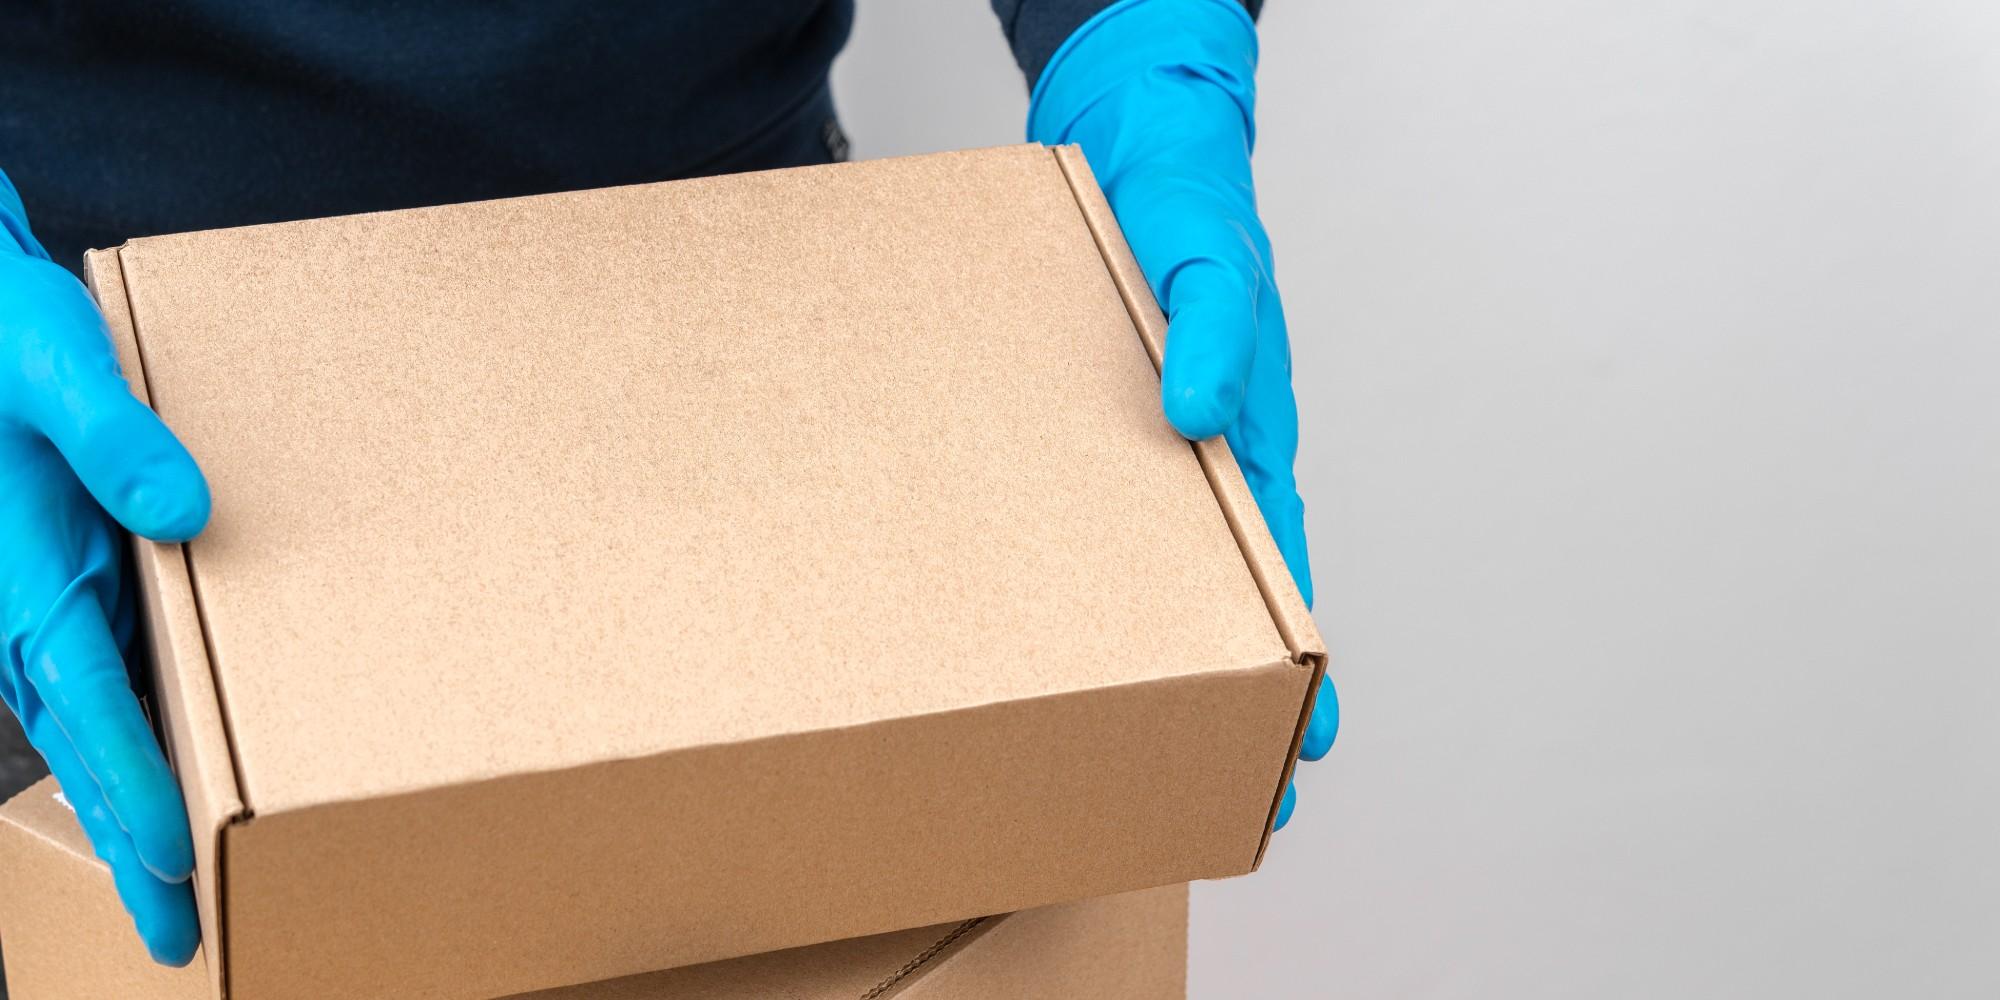 Construction Site COVID-19 protocols delivery pick ups